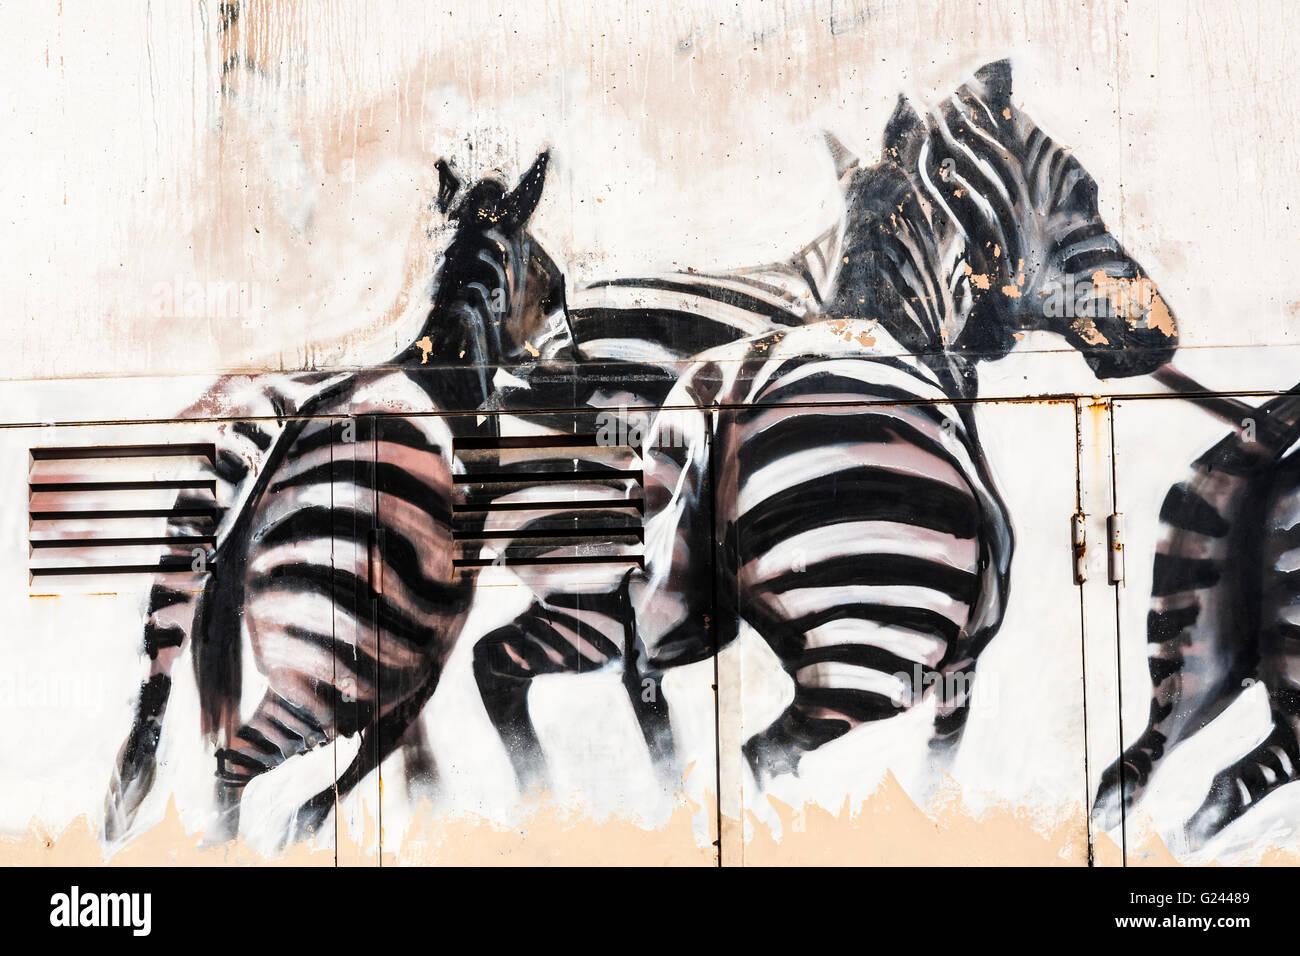 Graffiti wall barcelona - Graffiti Zebra On A Barcelona Wall Catalonia Spain